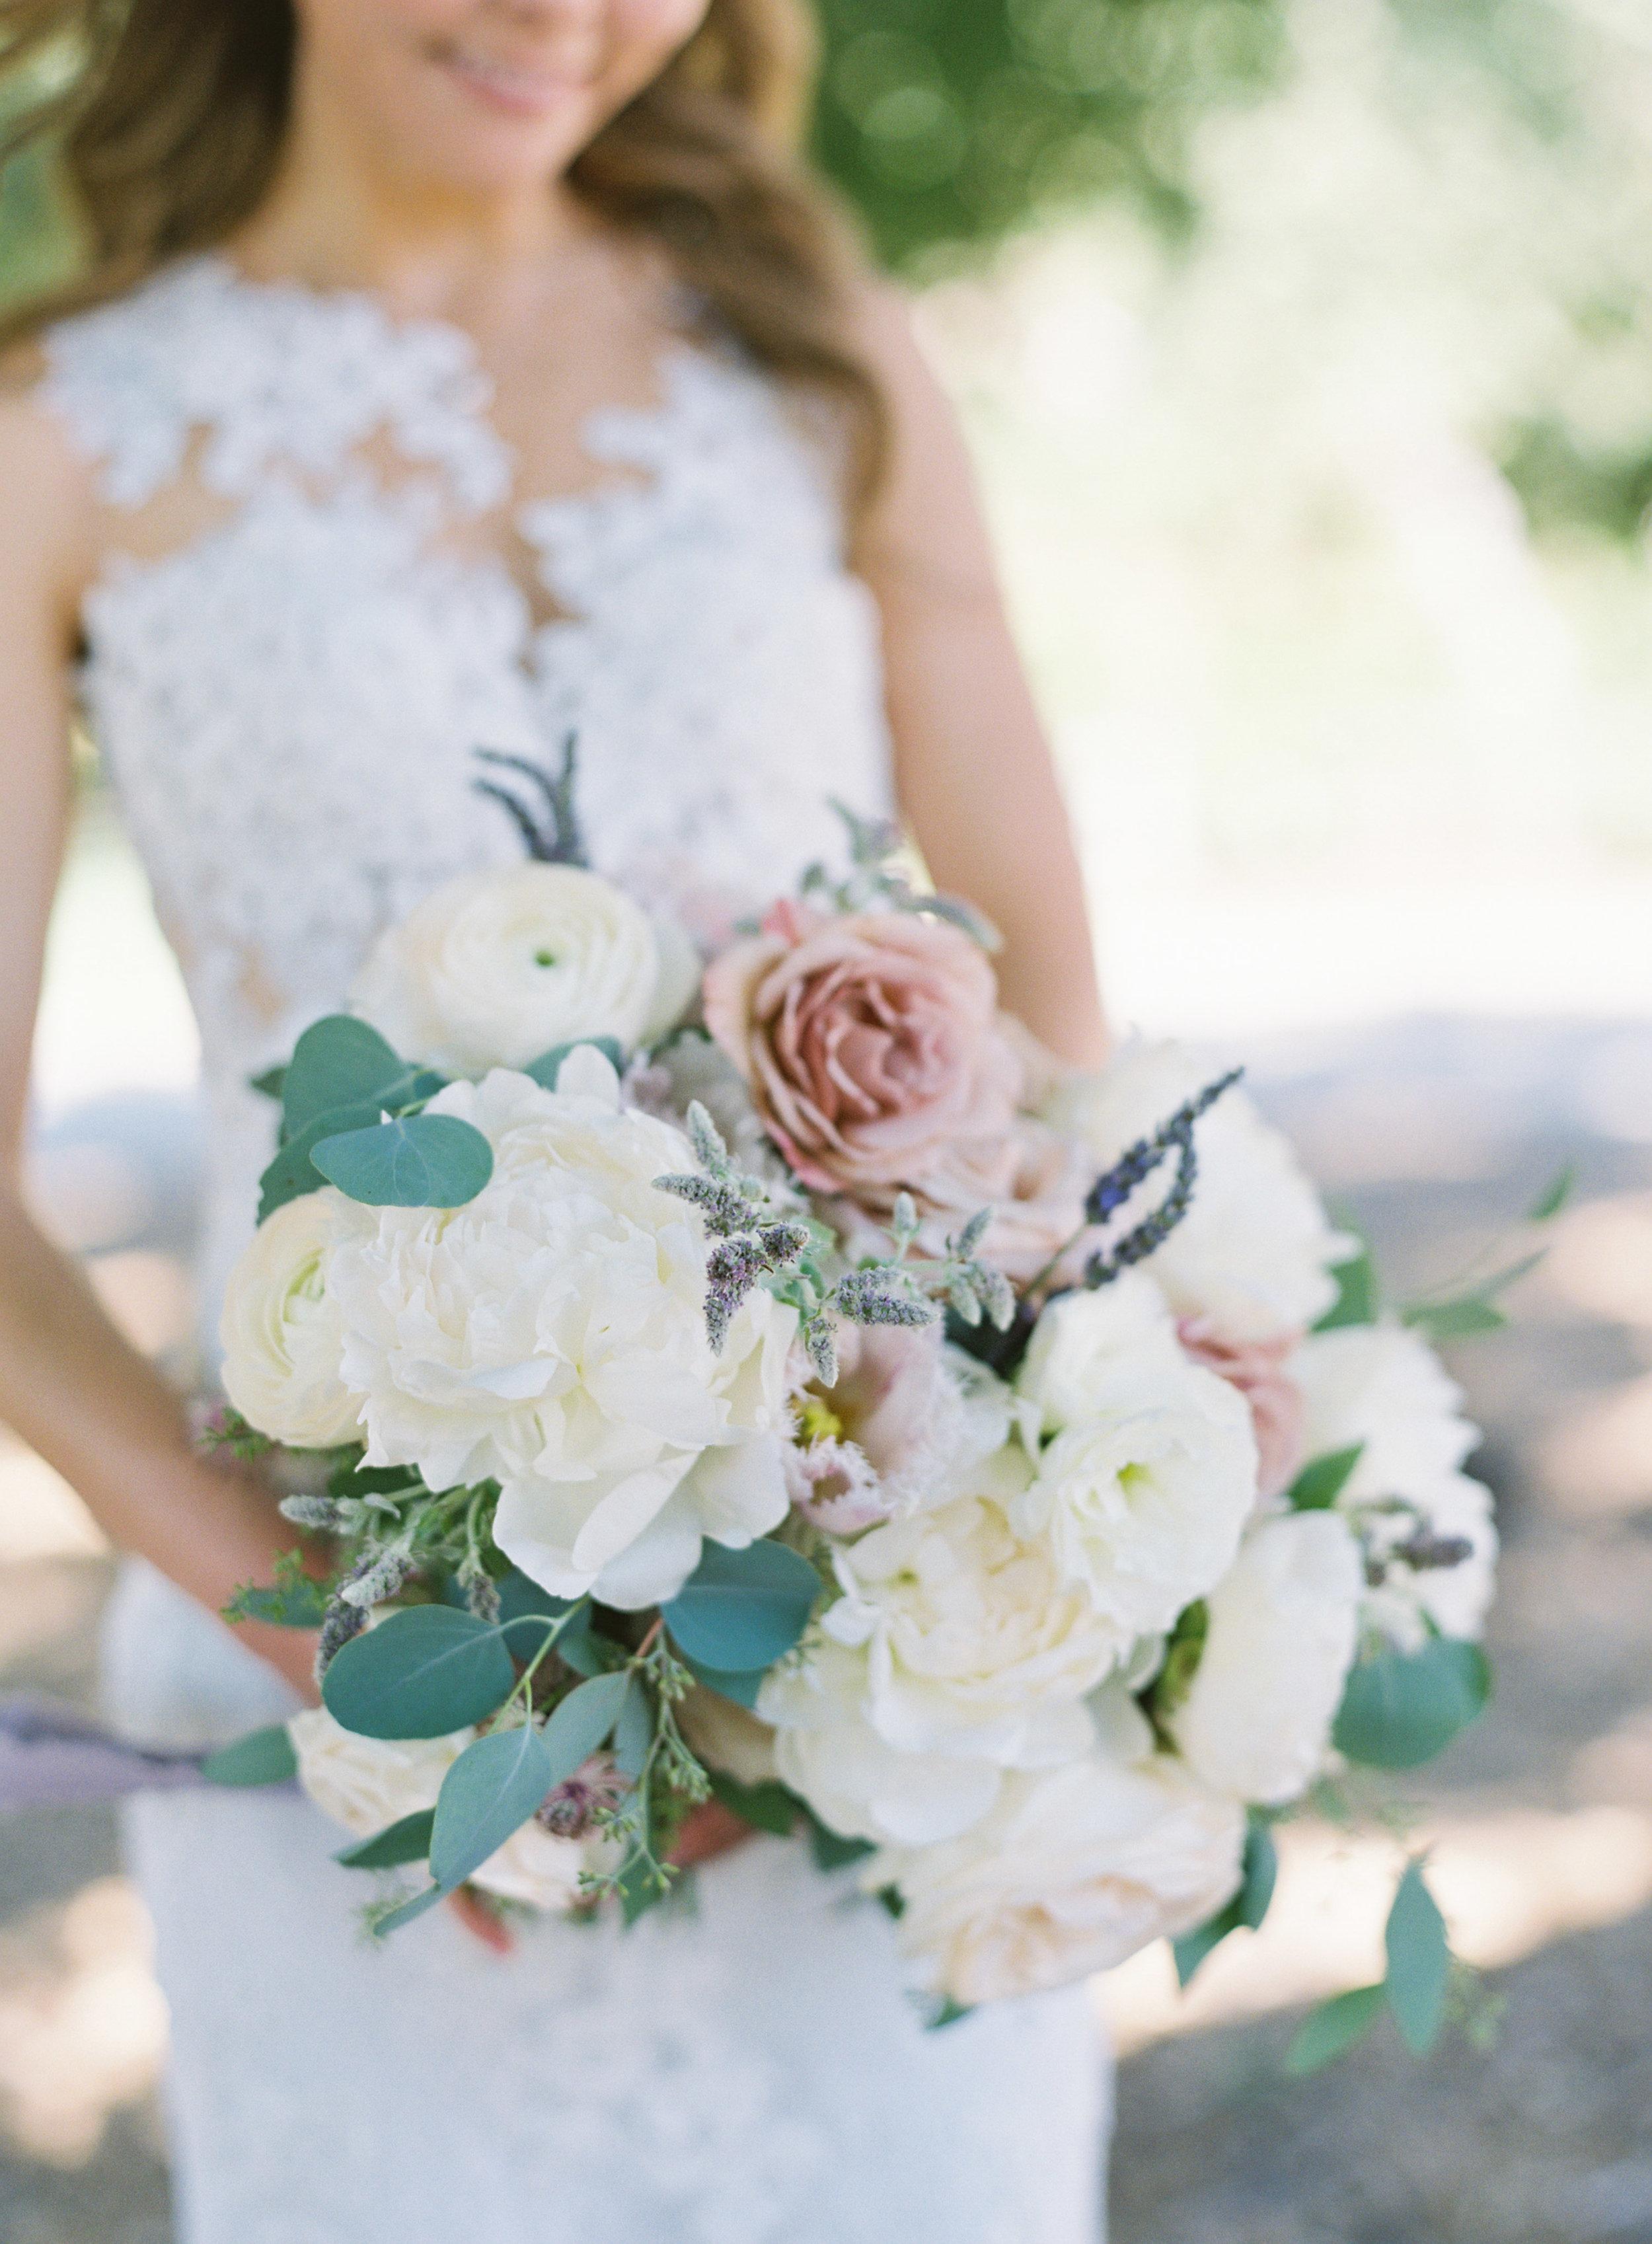 Triunfo_Creek_Winery_Wedding-21-Jen-Huang-JL-396-Jen-Huang-009969-R1-008.jpg